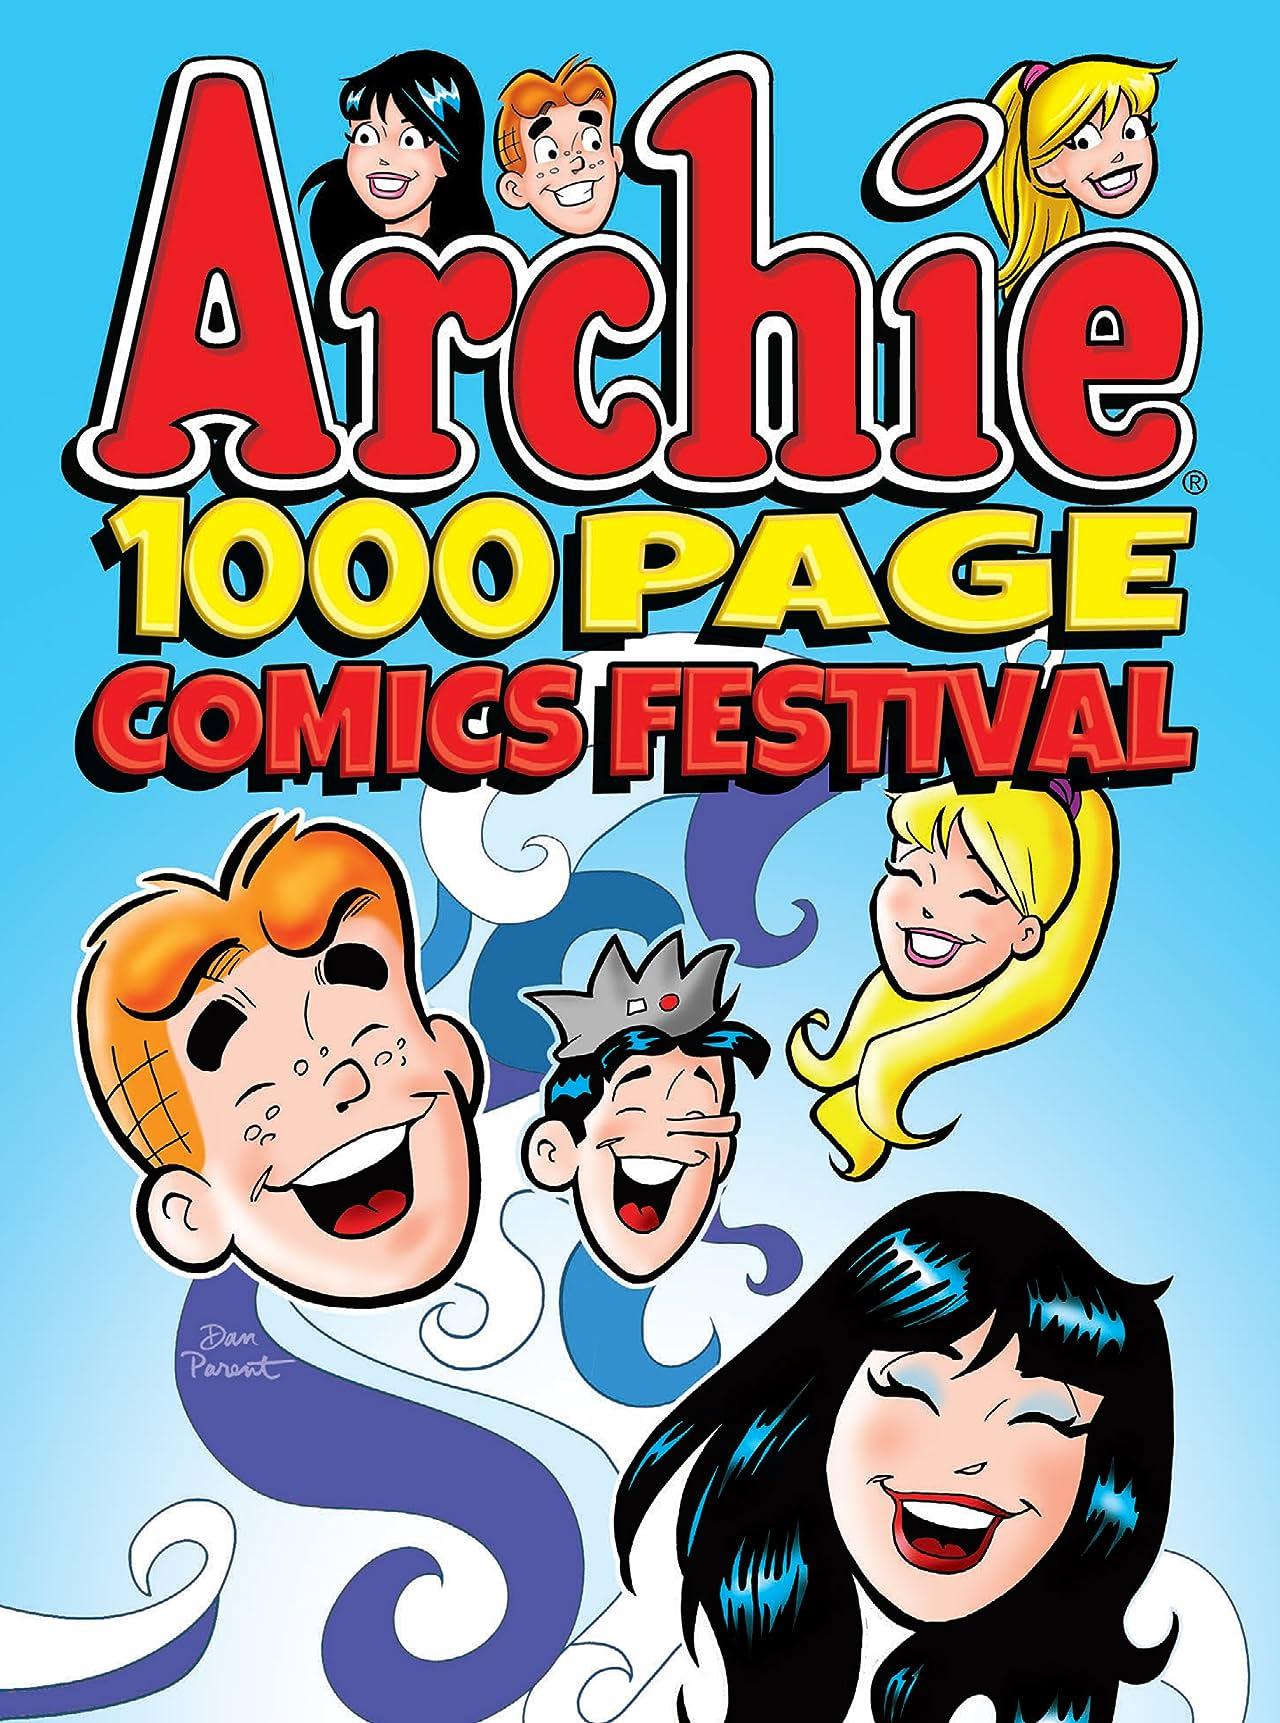 Archie 1000 Page Festival